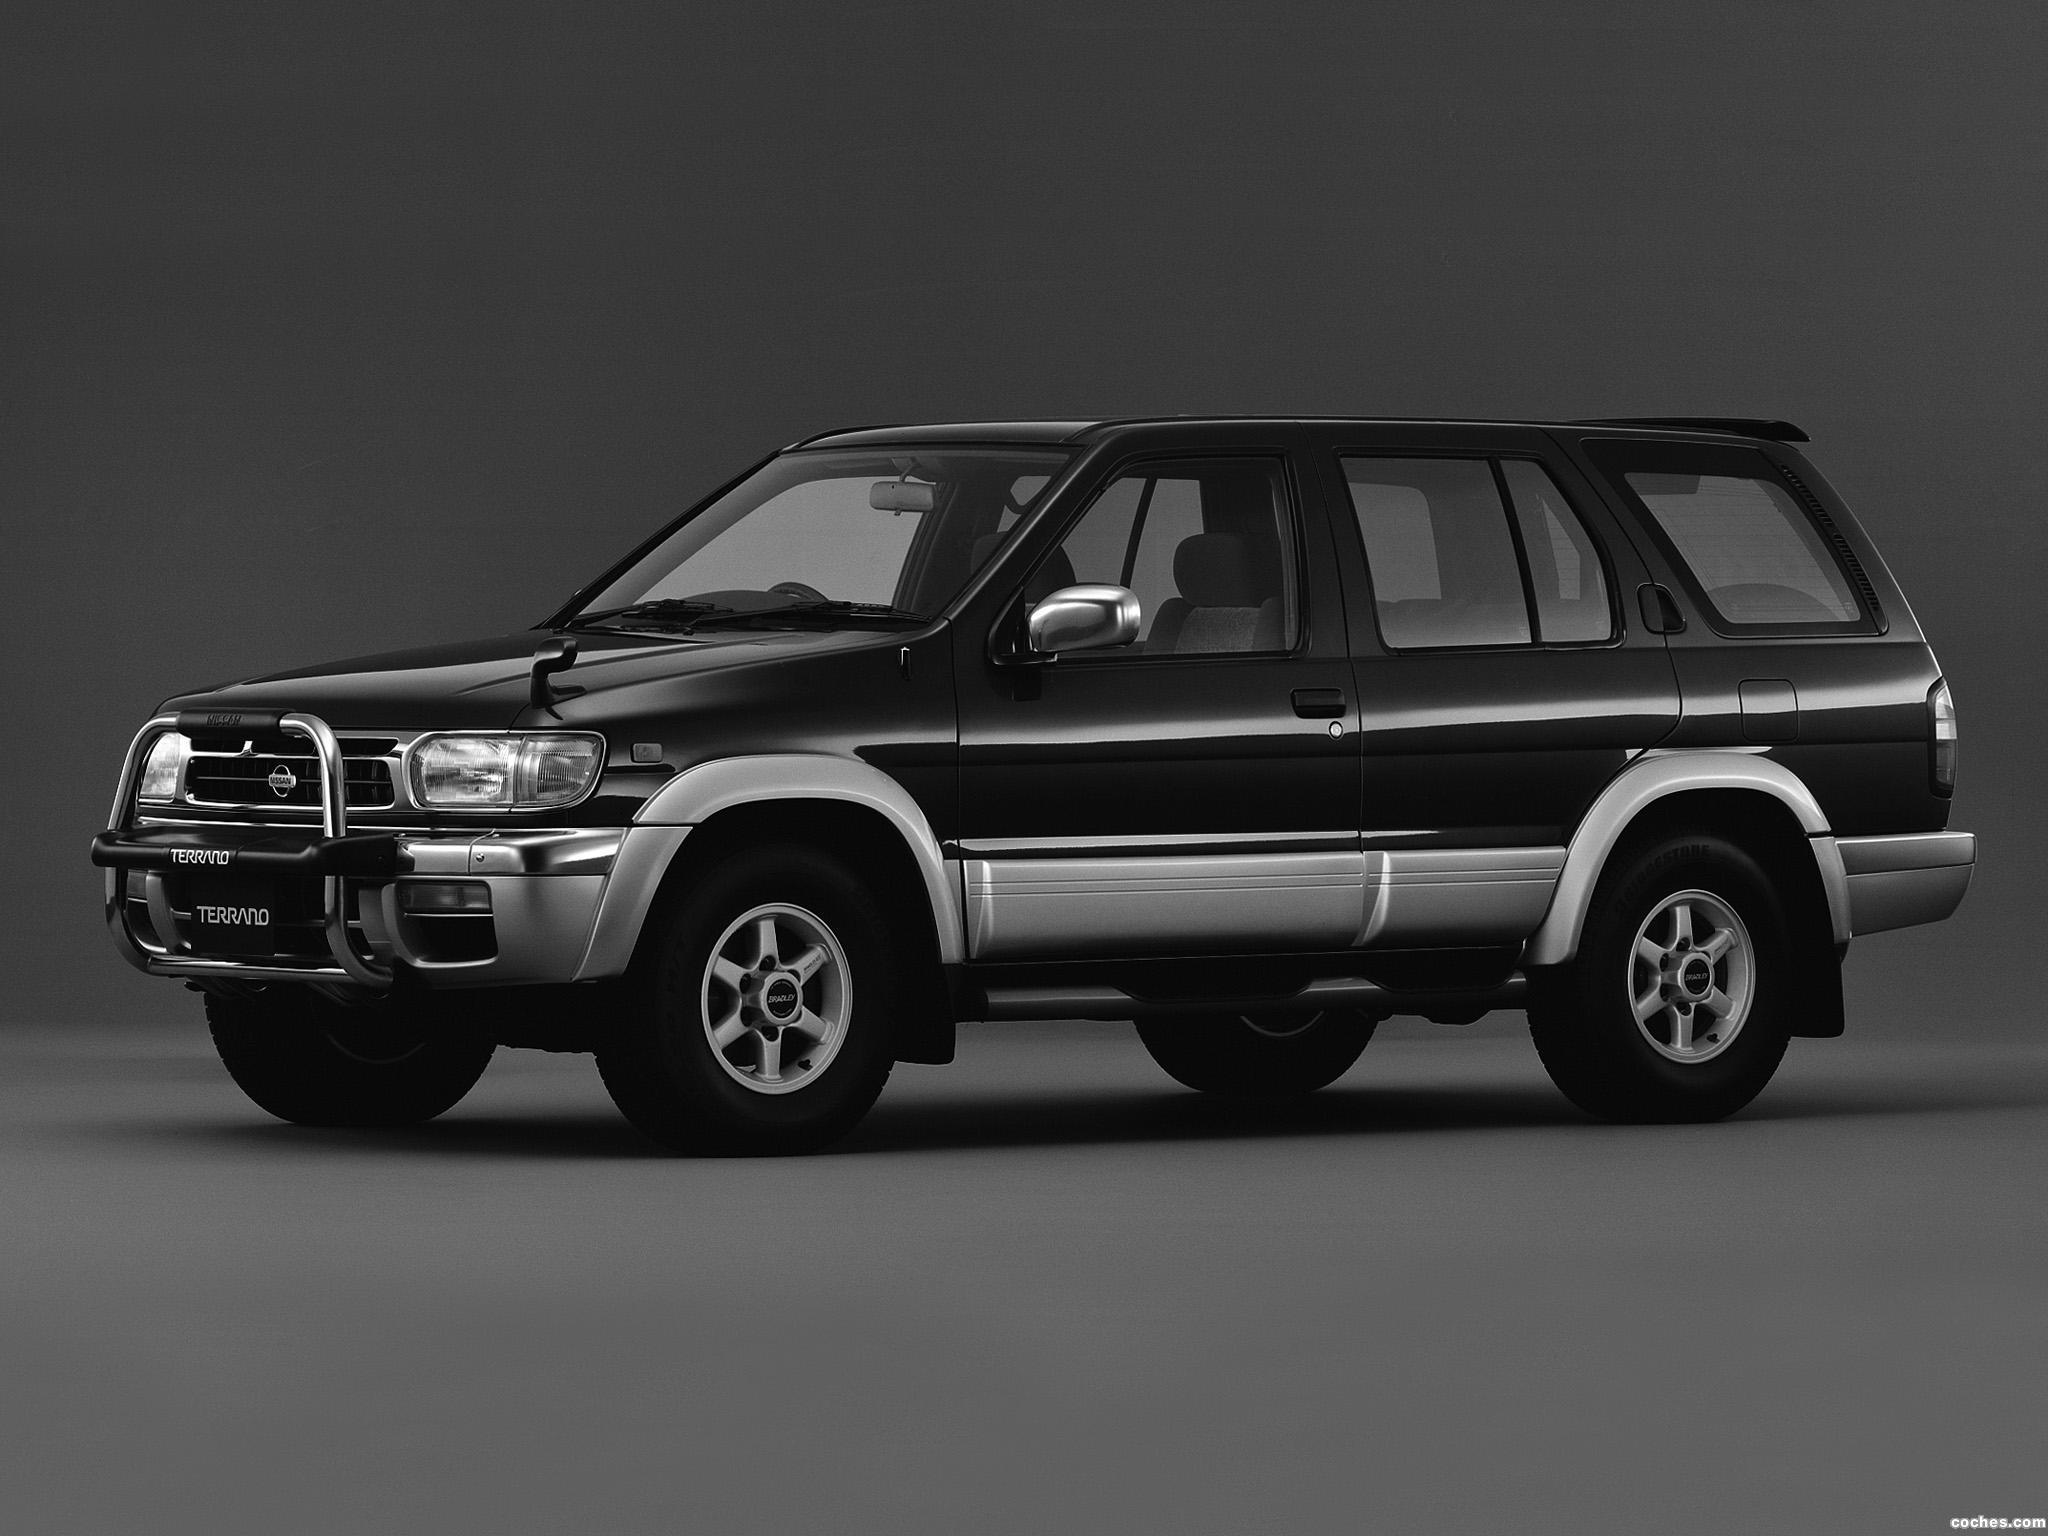 Foto 0 de Nissan Terrano 4x4 R3M R Limited PR50 1995